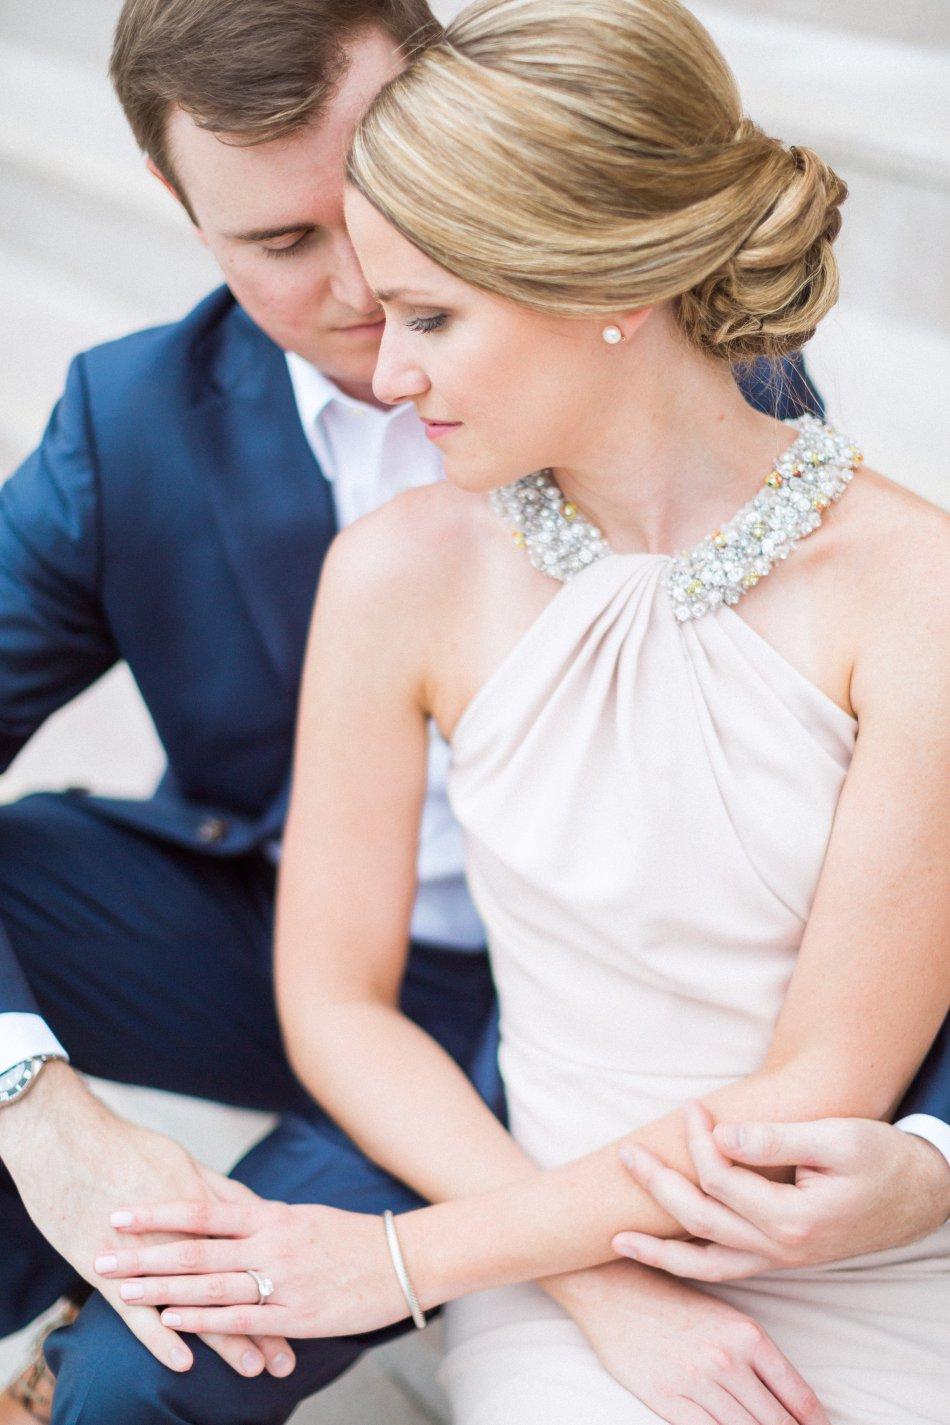 ringling-museum-wedding-sarasota-luxury-engagement-photography_0731.jpg